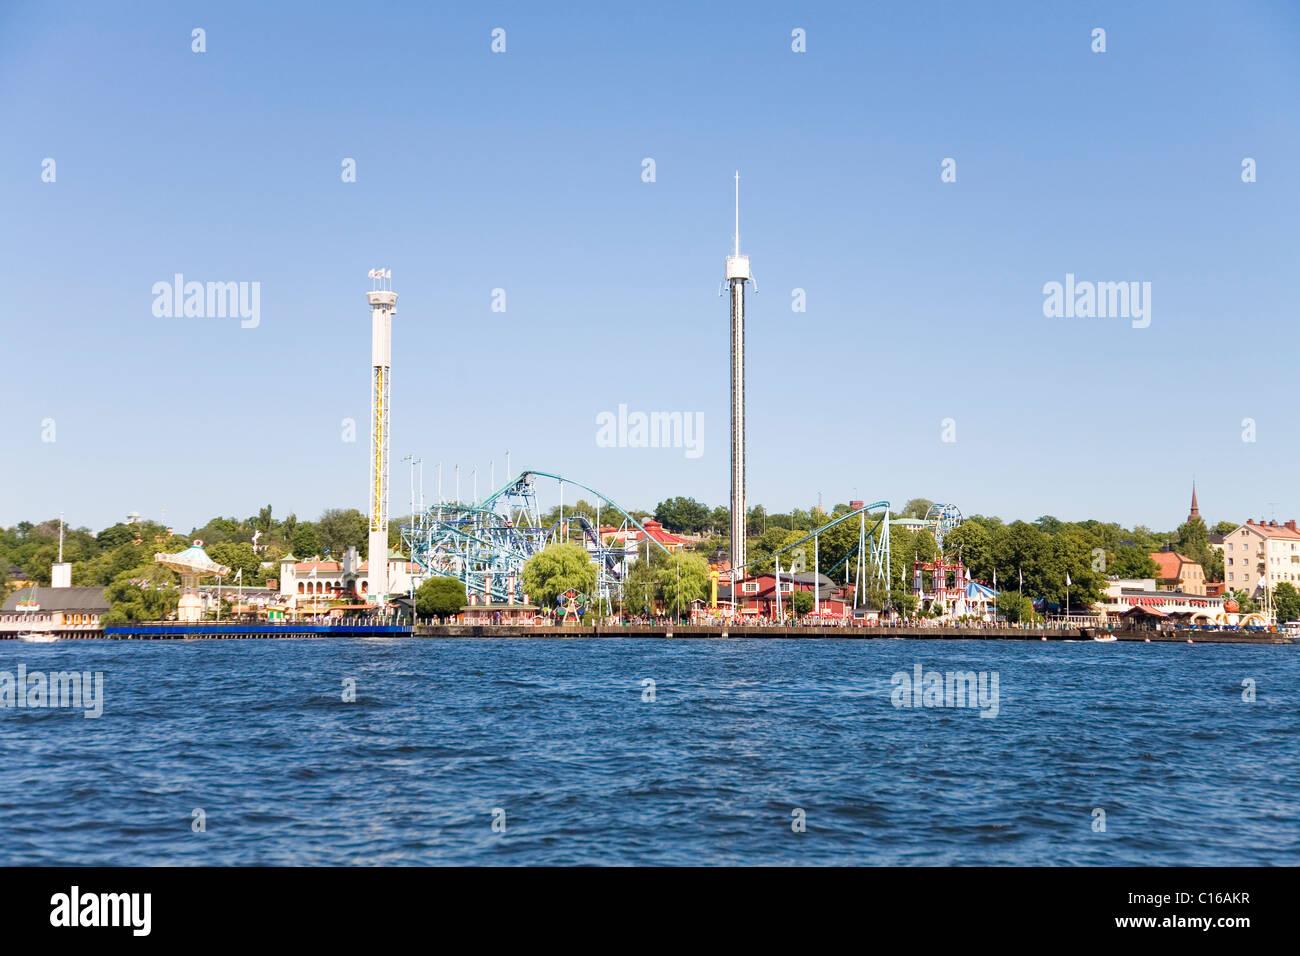 View towards the amusement park Groena Lunds Tivoli, Djurgården, Stockholm, Sweden, Scandinavia, Europe - Stock Image